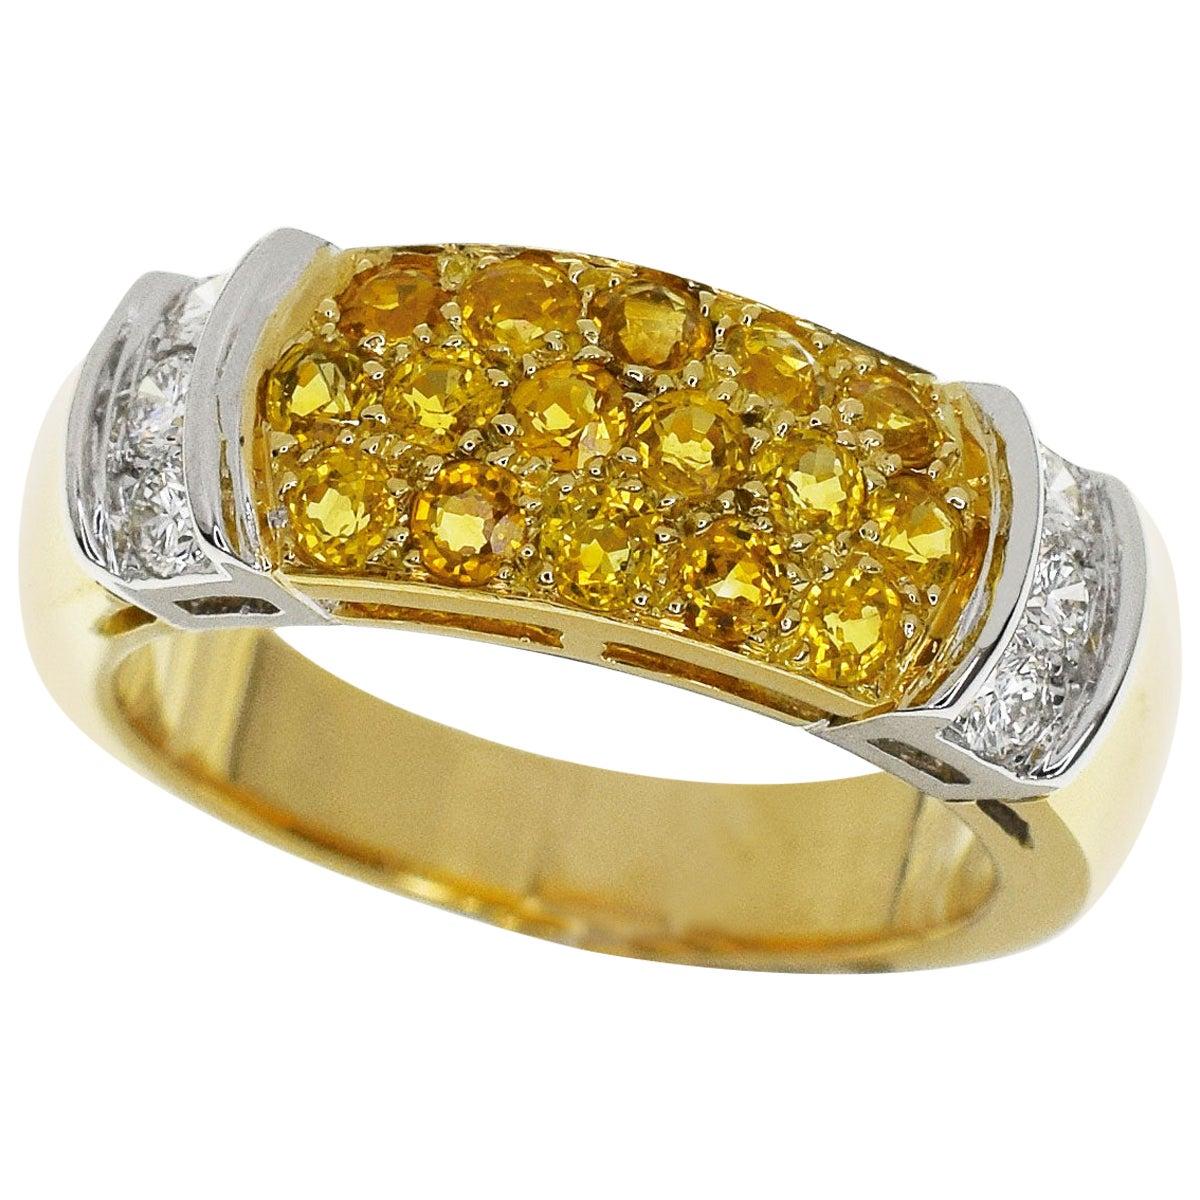 Van Cleef & Arpels 18 Karat Yellow White Gold Yellow Sapphire Diamond Ring US 6